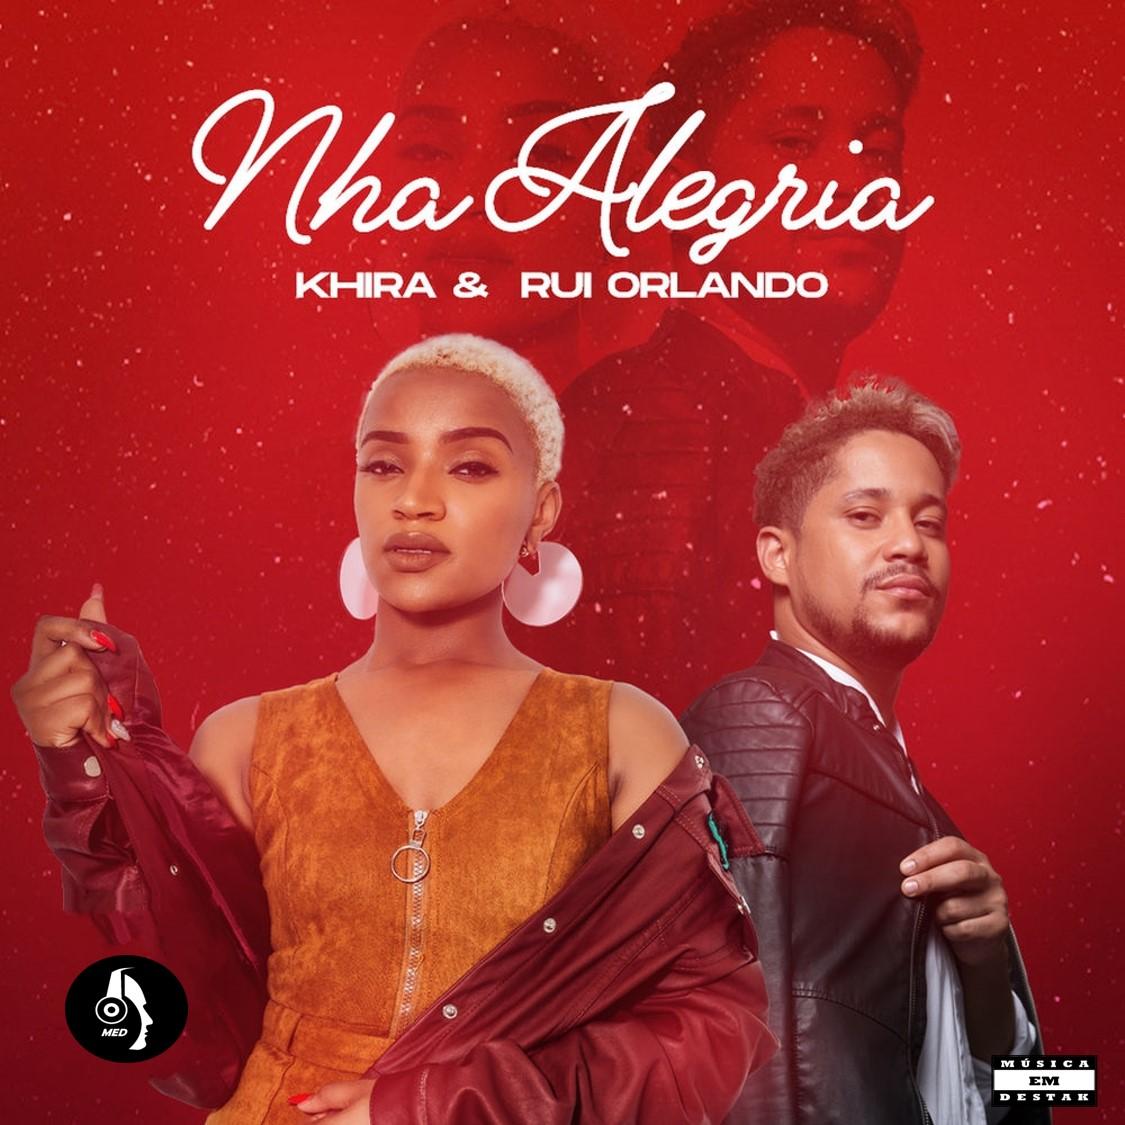 Khira - Nha Alegria (Feat. Rui Orlando)